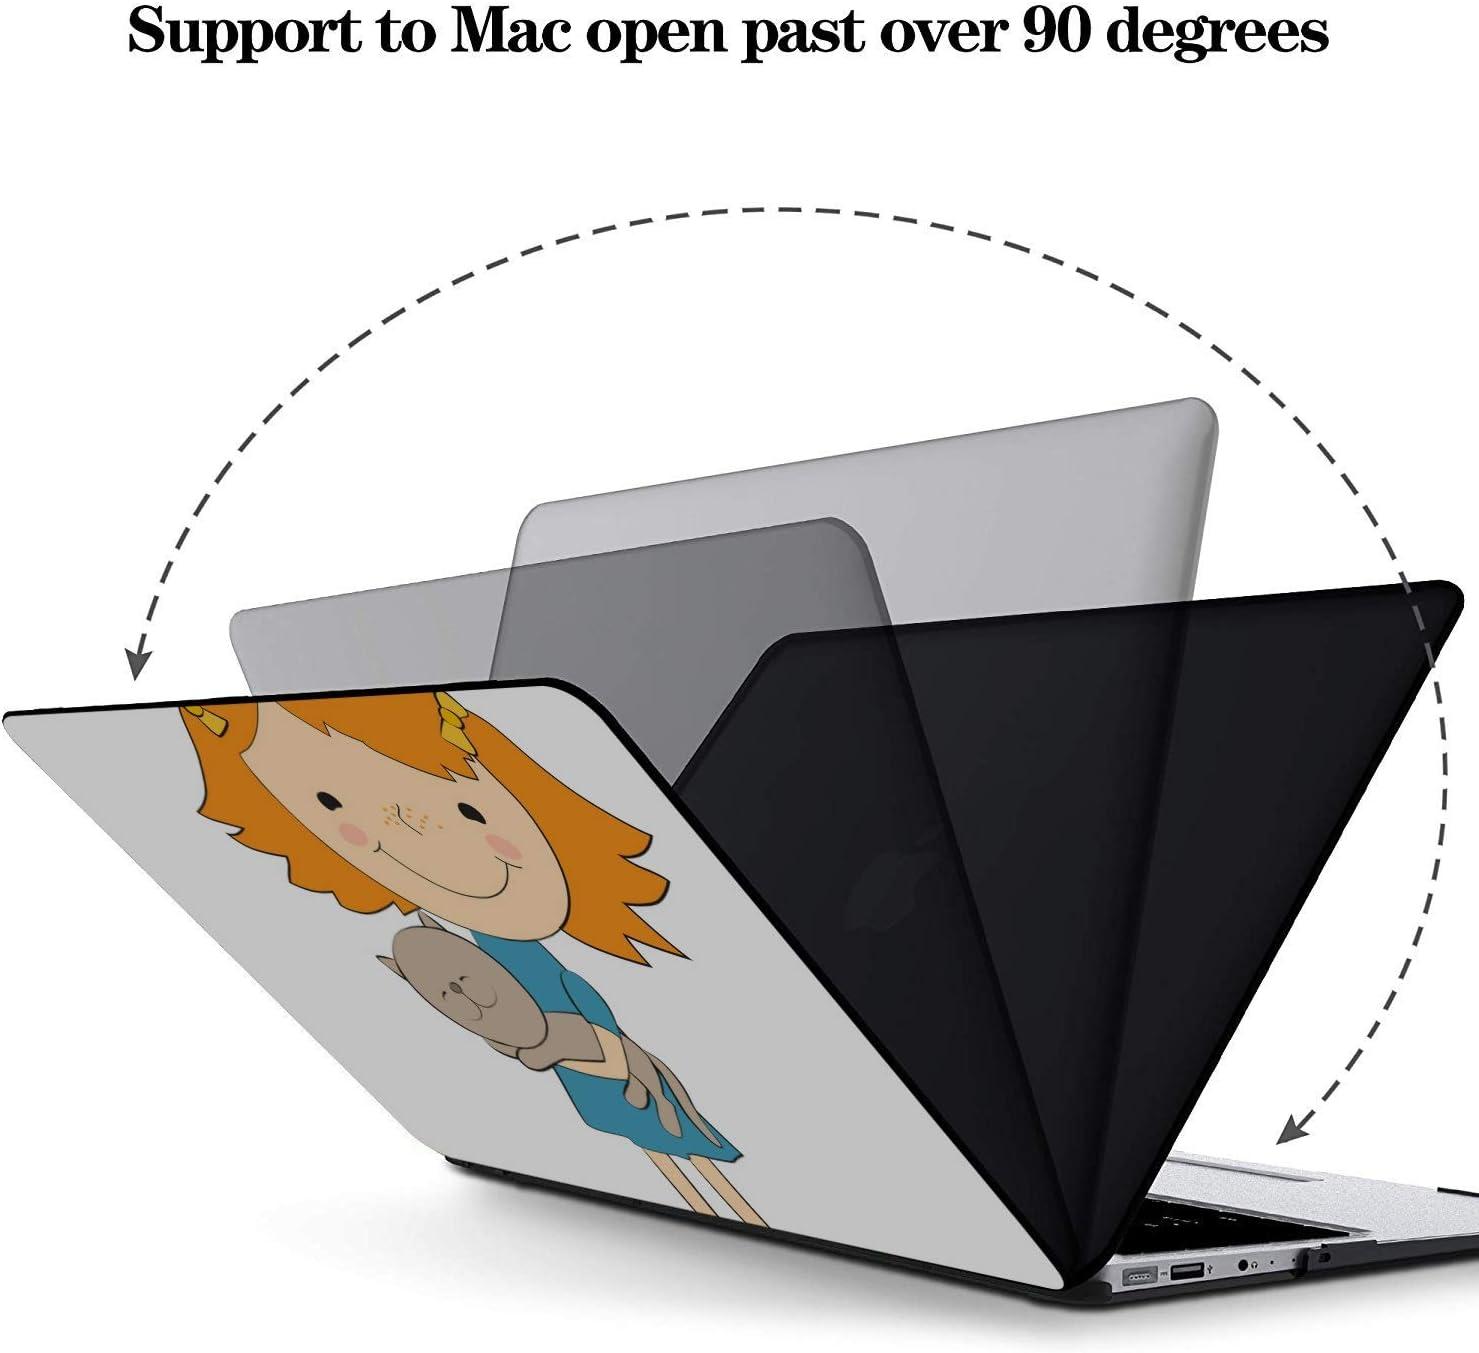 MacBook Pro Laptop Case Cartoon Little Girls Pretty Fashion Plastic Hard Shell Compatible Mac Air 11 Pro 13 15 13 MacBook Case Protection for MacBook 2016-2019 Version